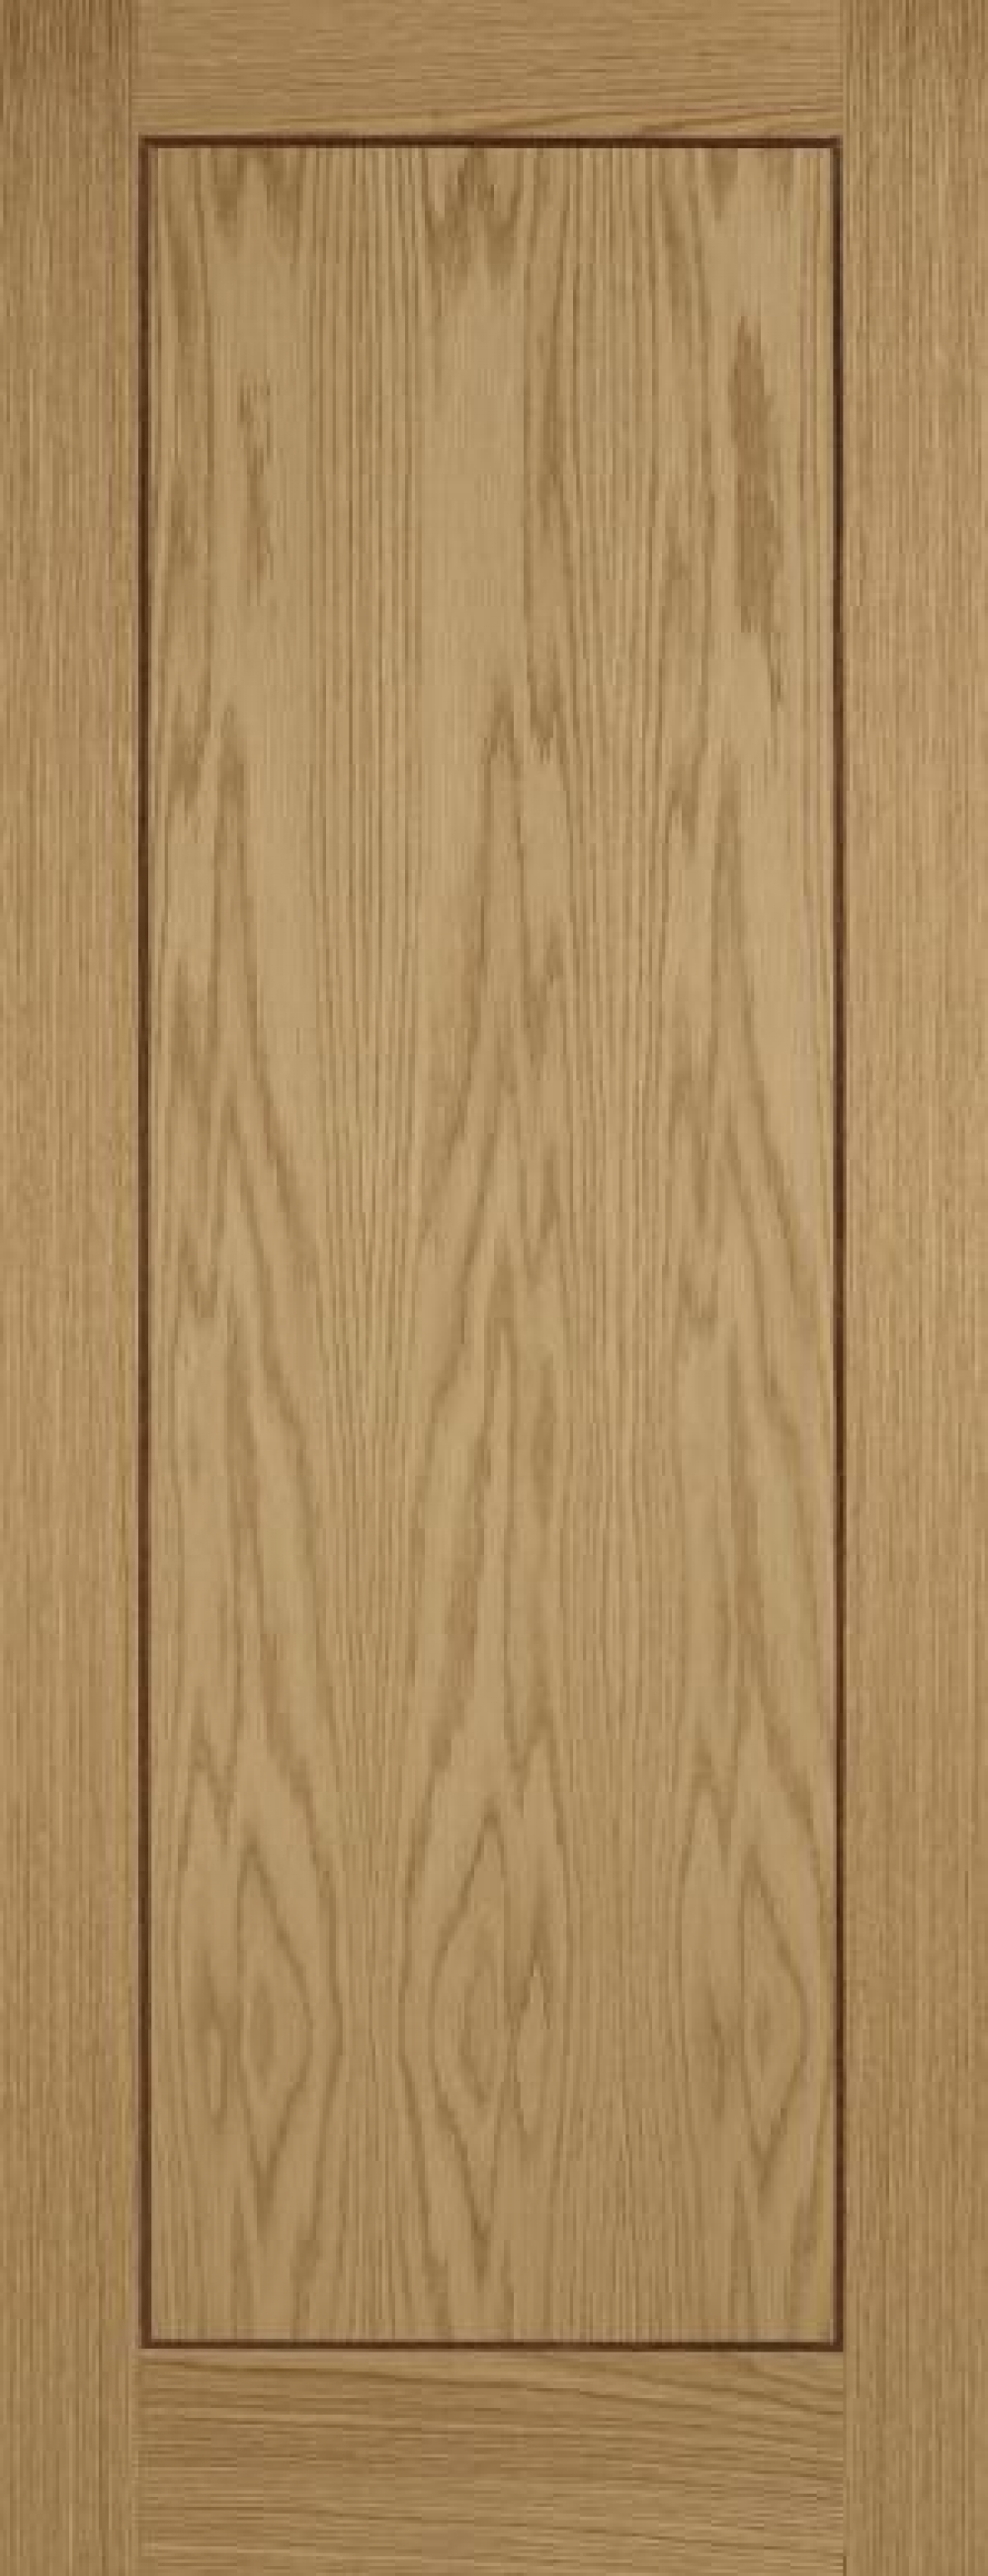 Oak Inlay 1 Panel